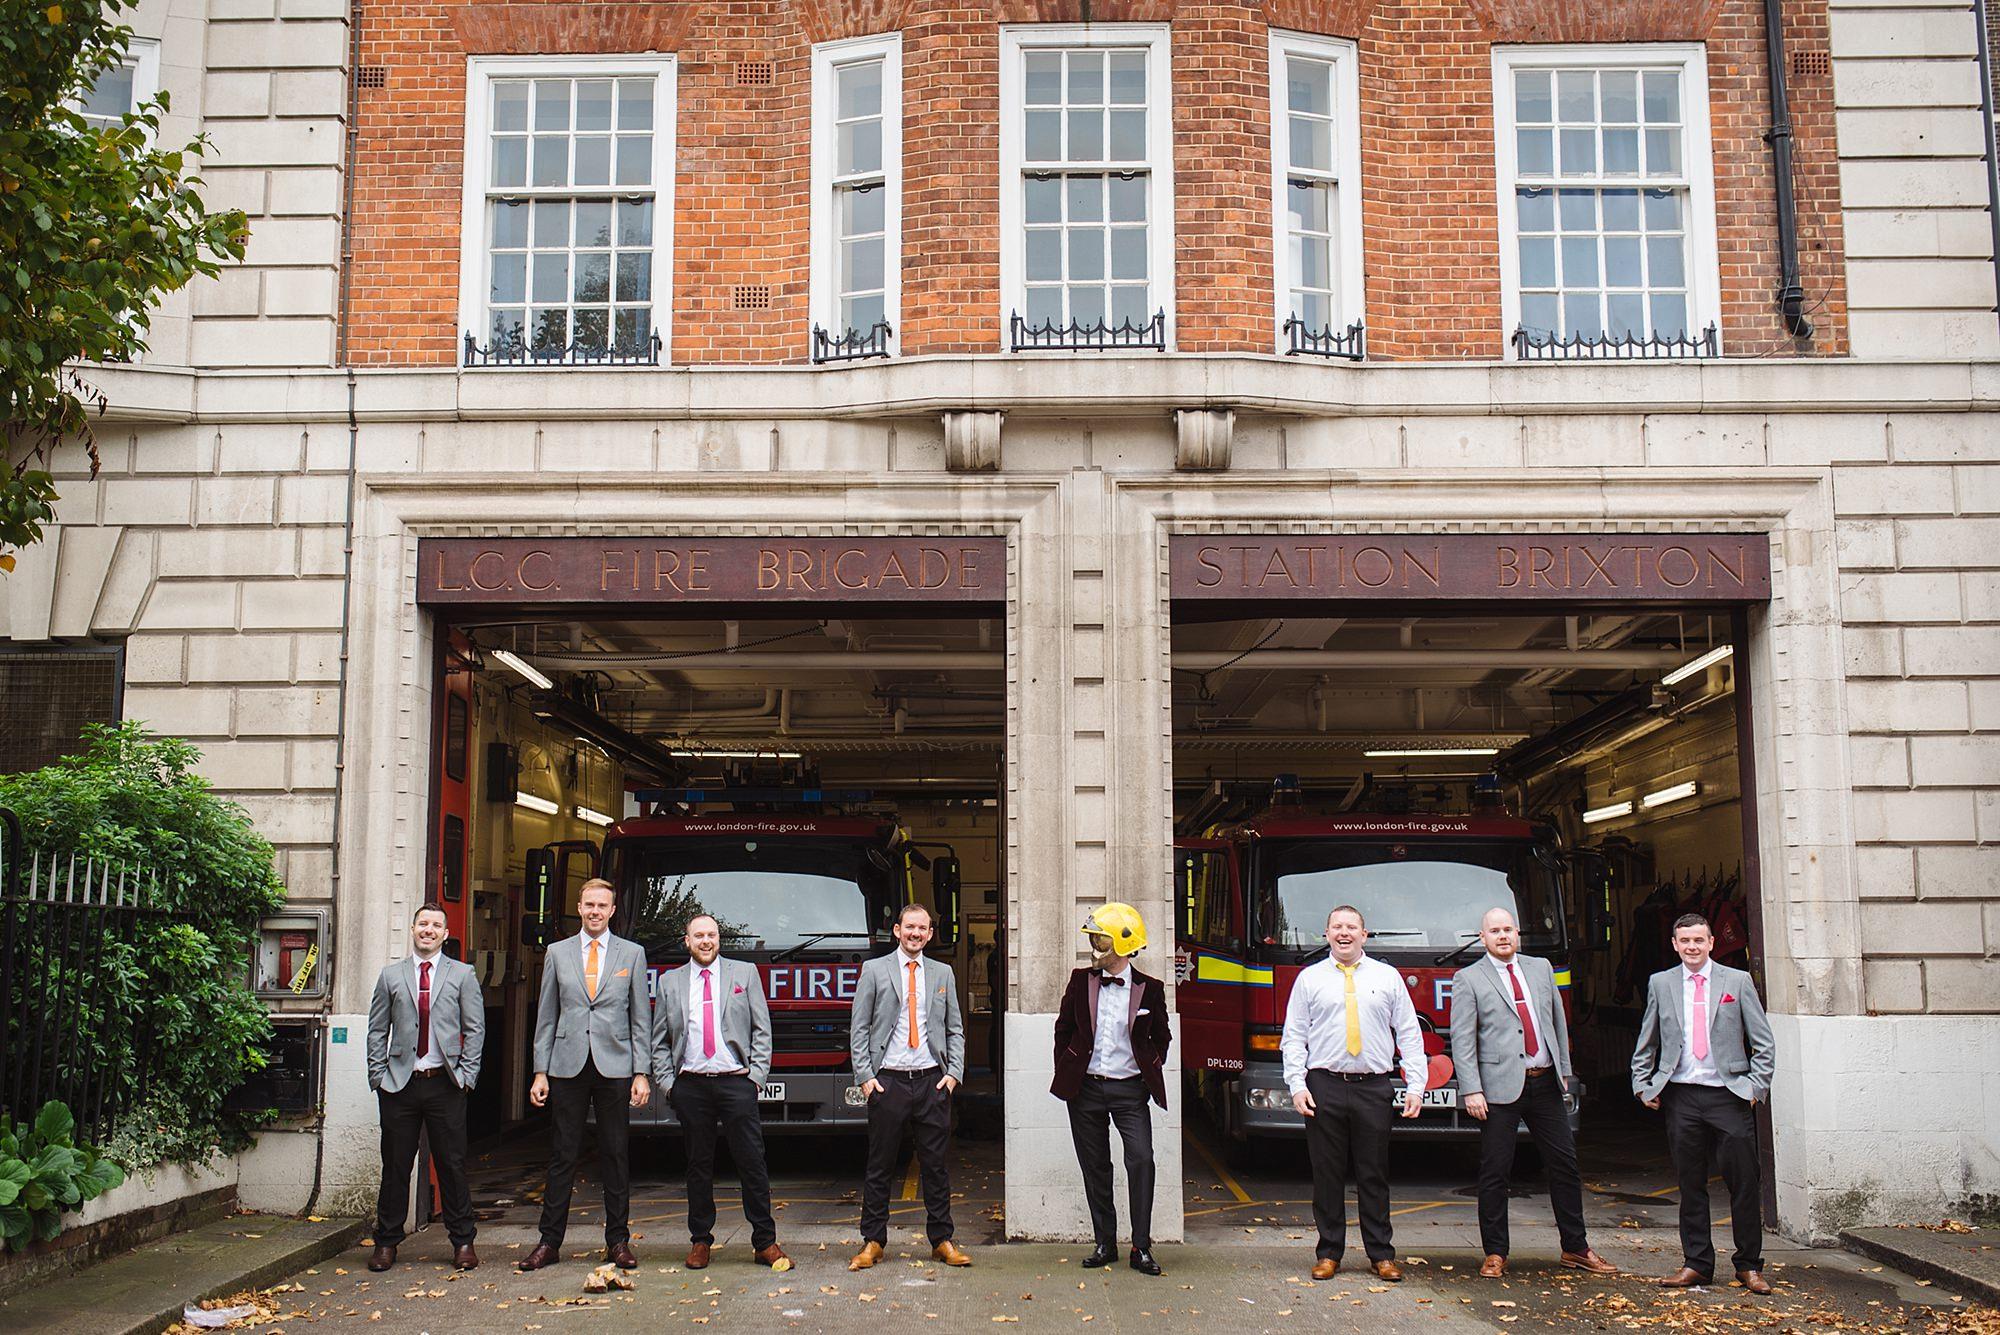 Fun London Wedding groom wearing fireman's helmet with groomsmen in front of brixton fire station